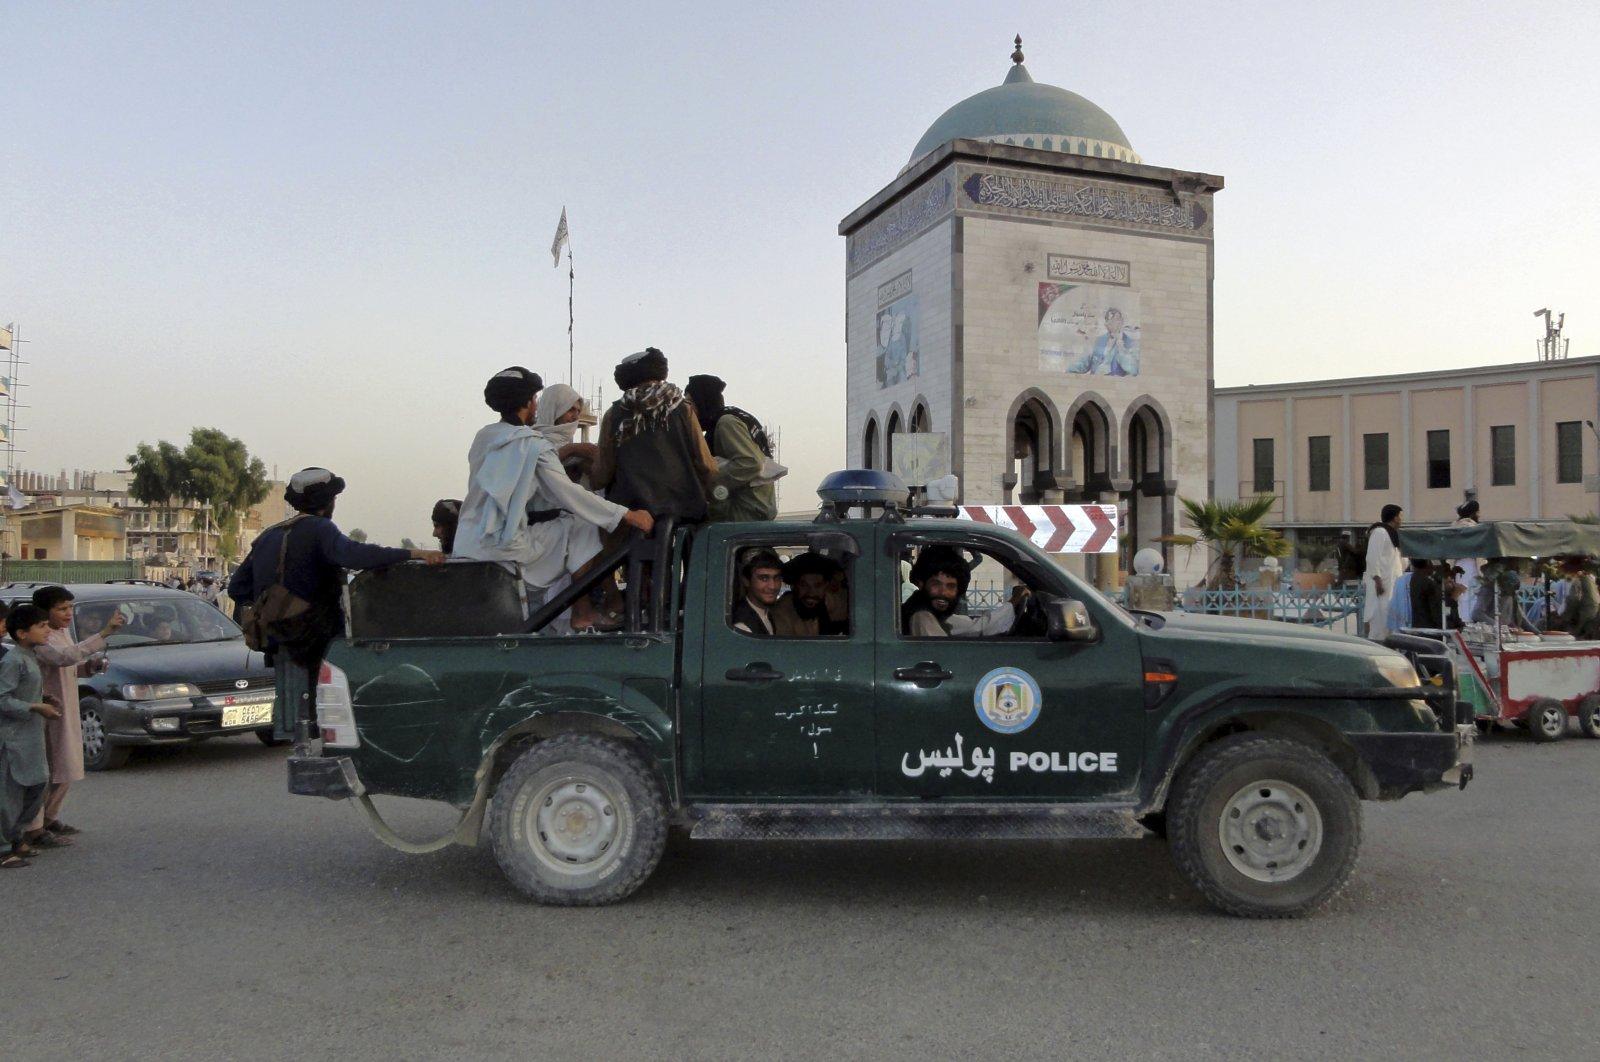 Taliban fighters patrol inside the city of Kandahar, southwest Afghanistan, Aug. 15, 2021. (AP Photo)